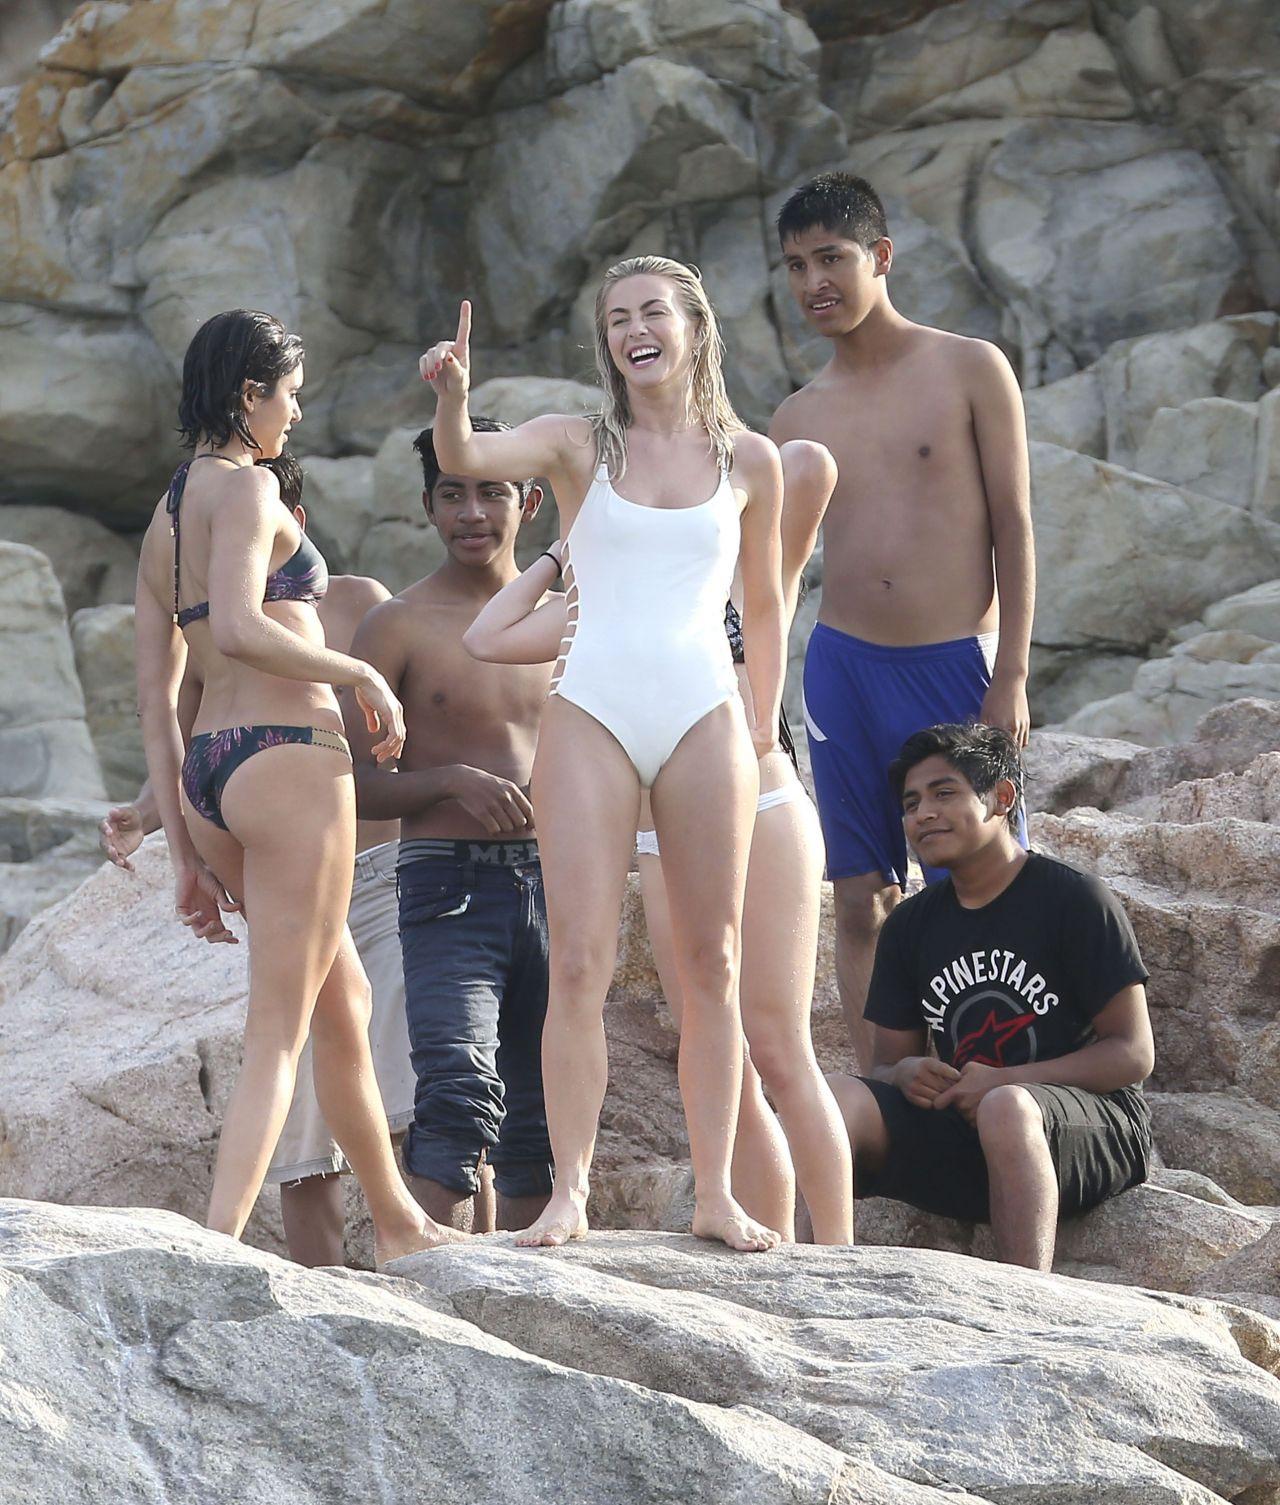 Julianne Hough Amp Nina Dobrev In Bikini Cabo San Lucas 3